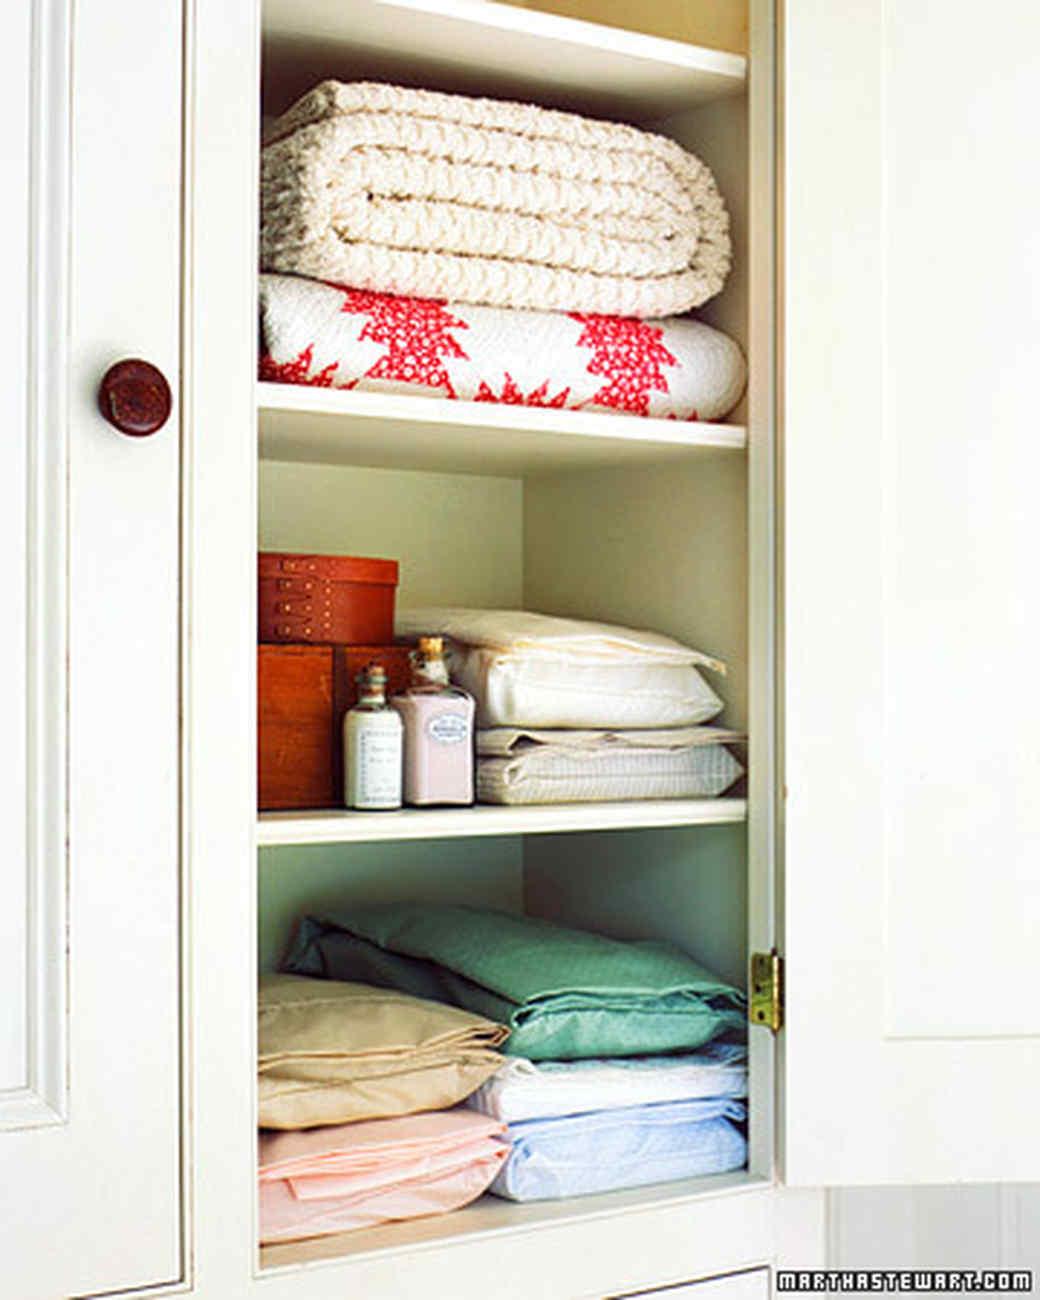 sc 1 st  Martha Stewart & Spring-Cleaning Closets and Drawers | Martha Stewart